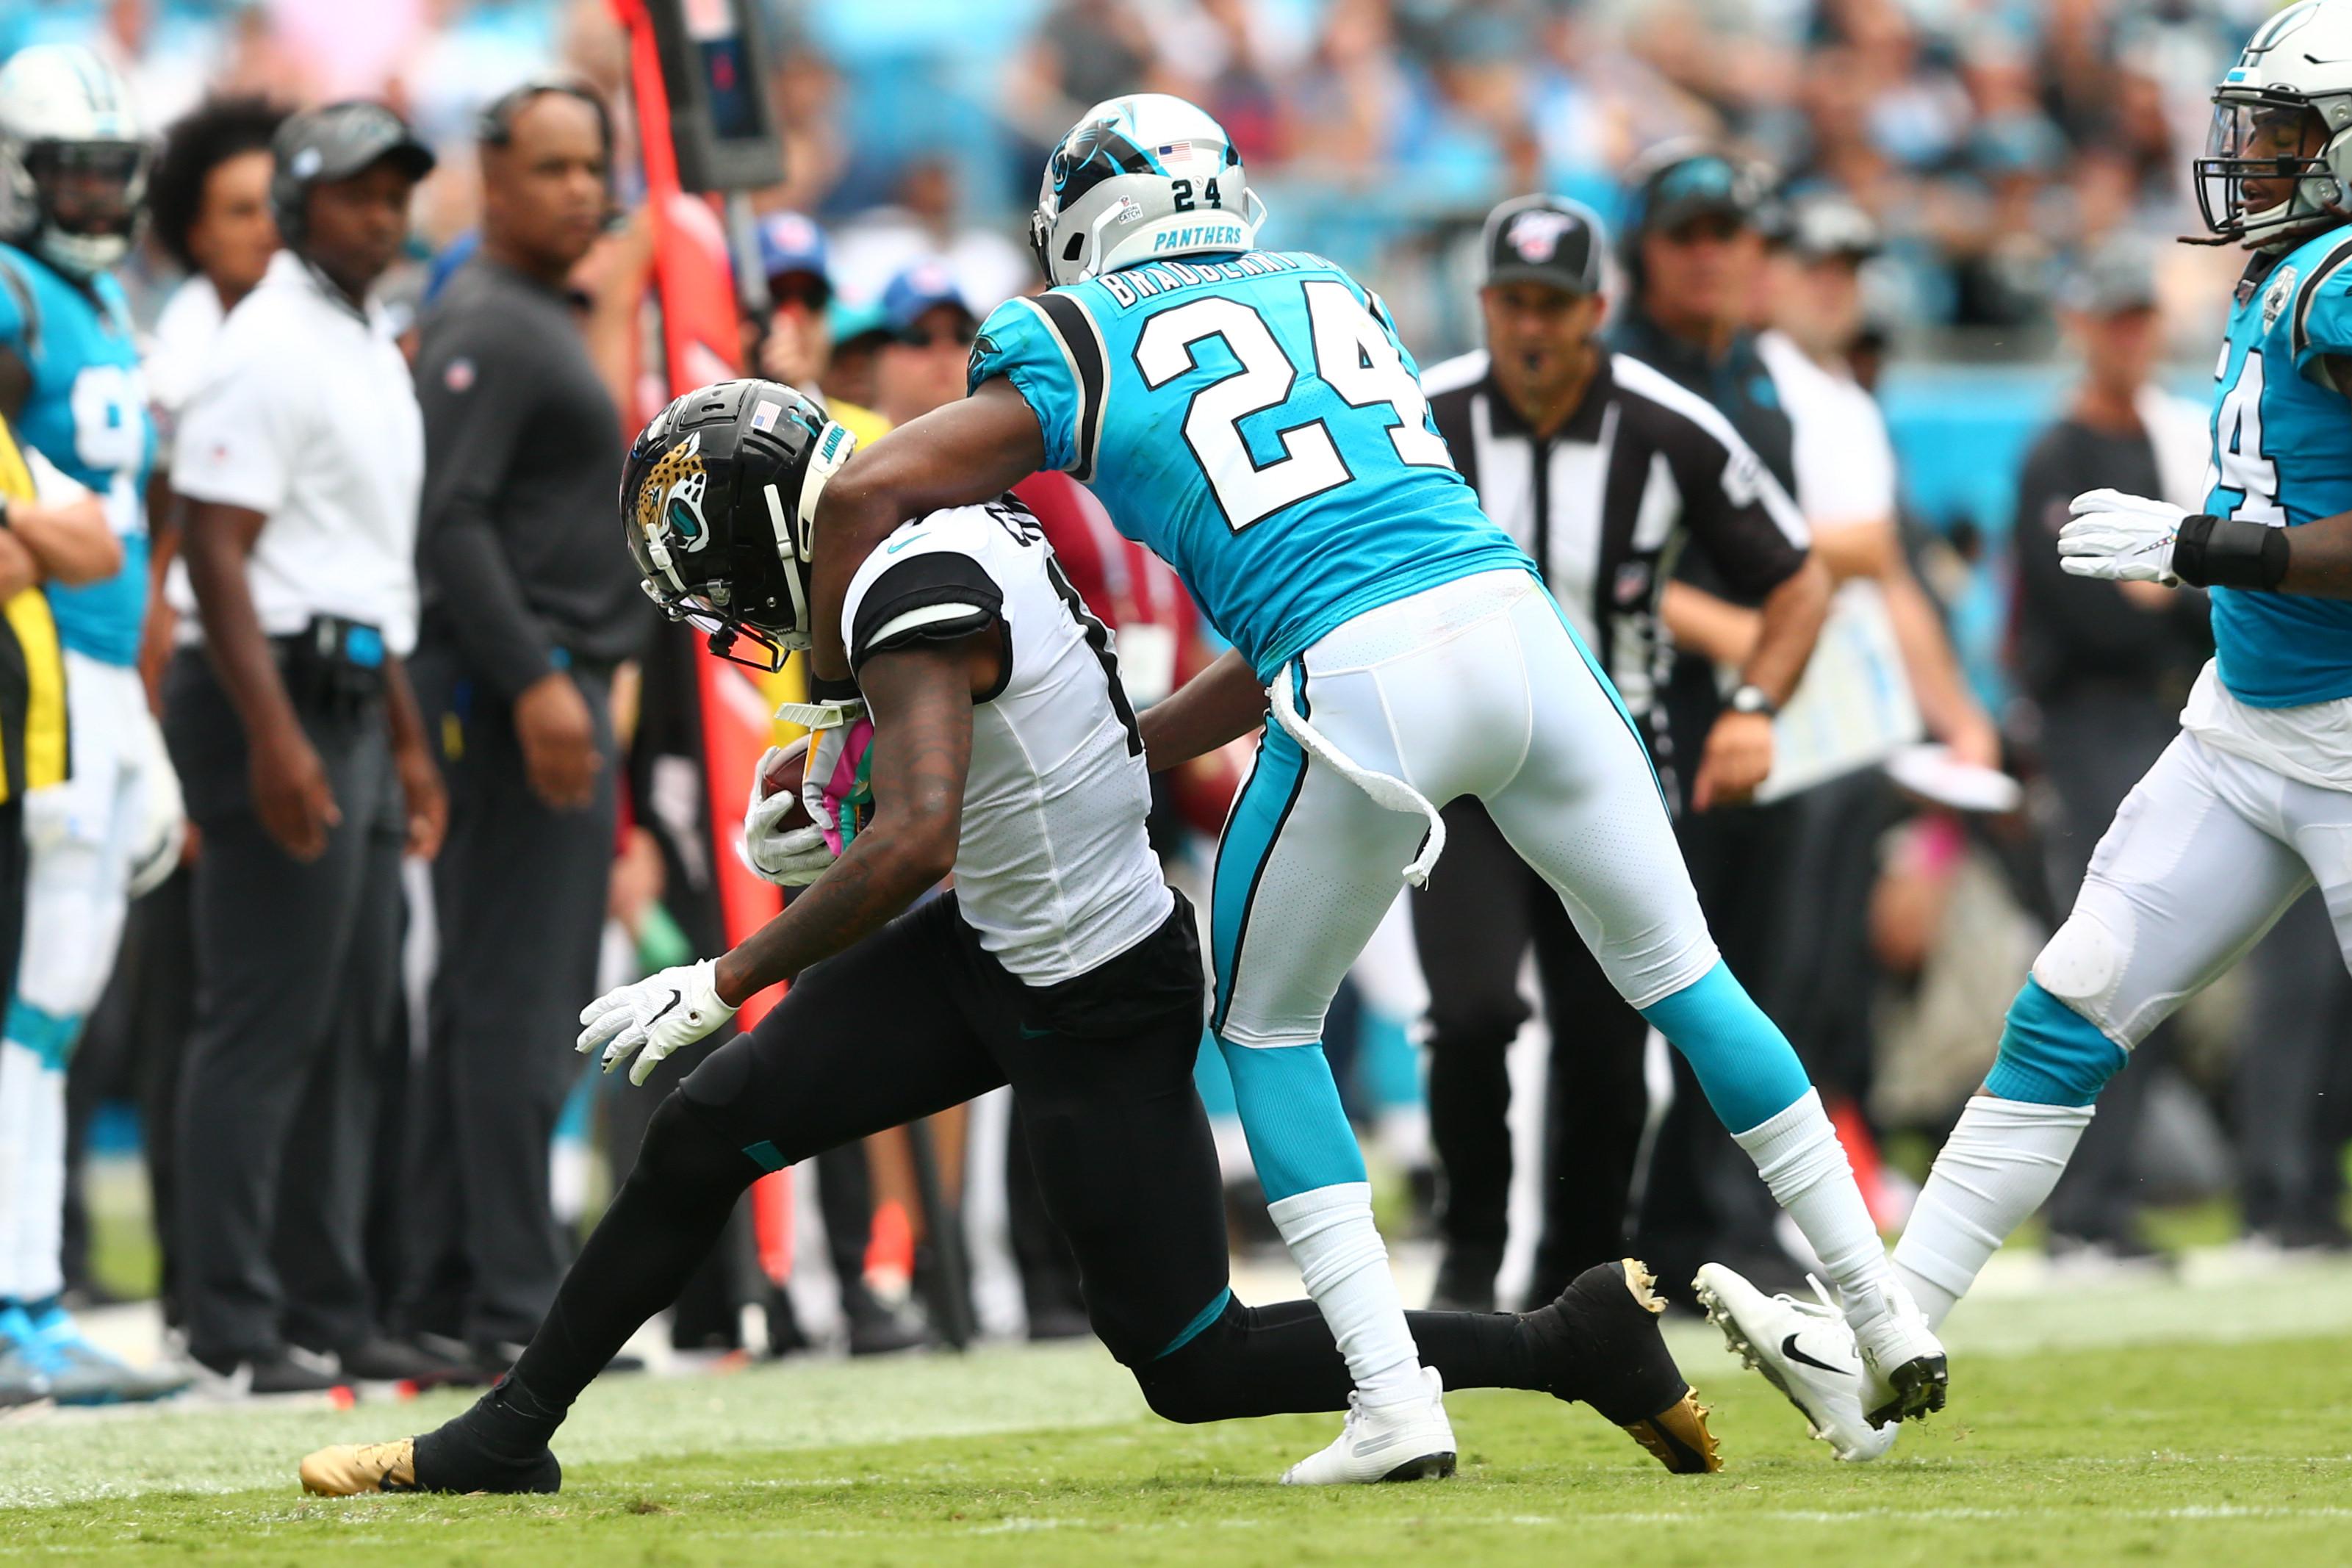 NFL: Jacksonville Jaguars at Carolina Panthers